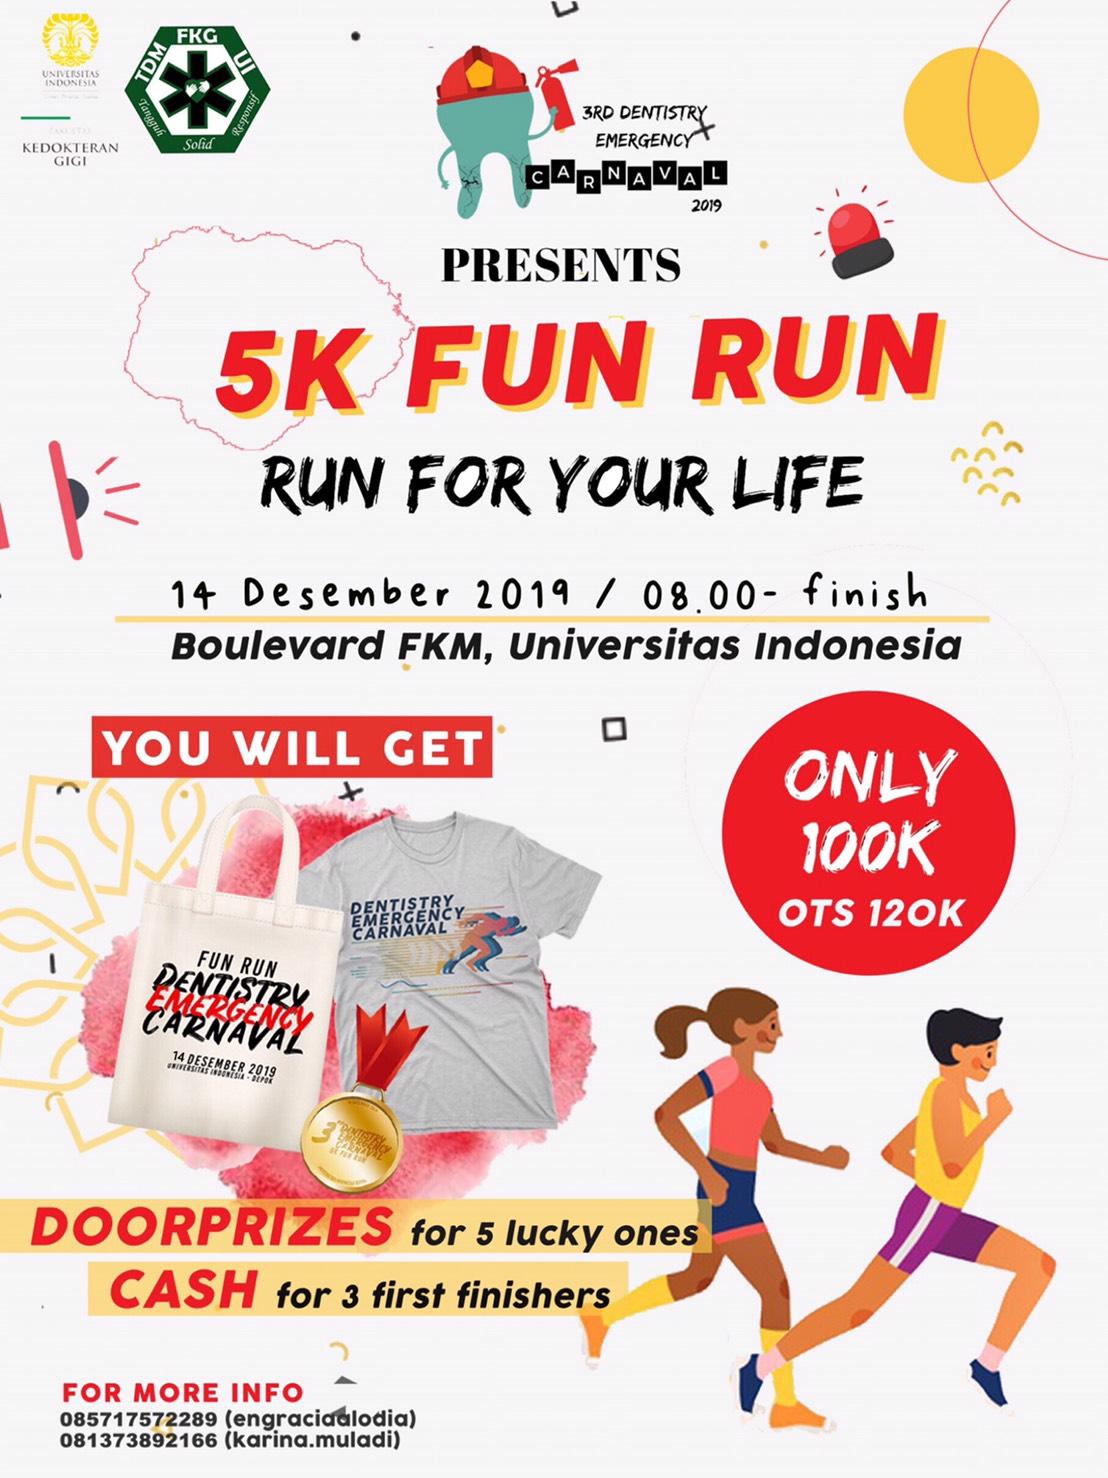 Dentistry Emergency Carnaval / DEC Fun Run • 2019